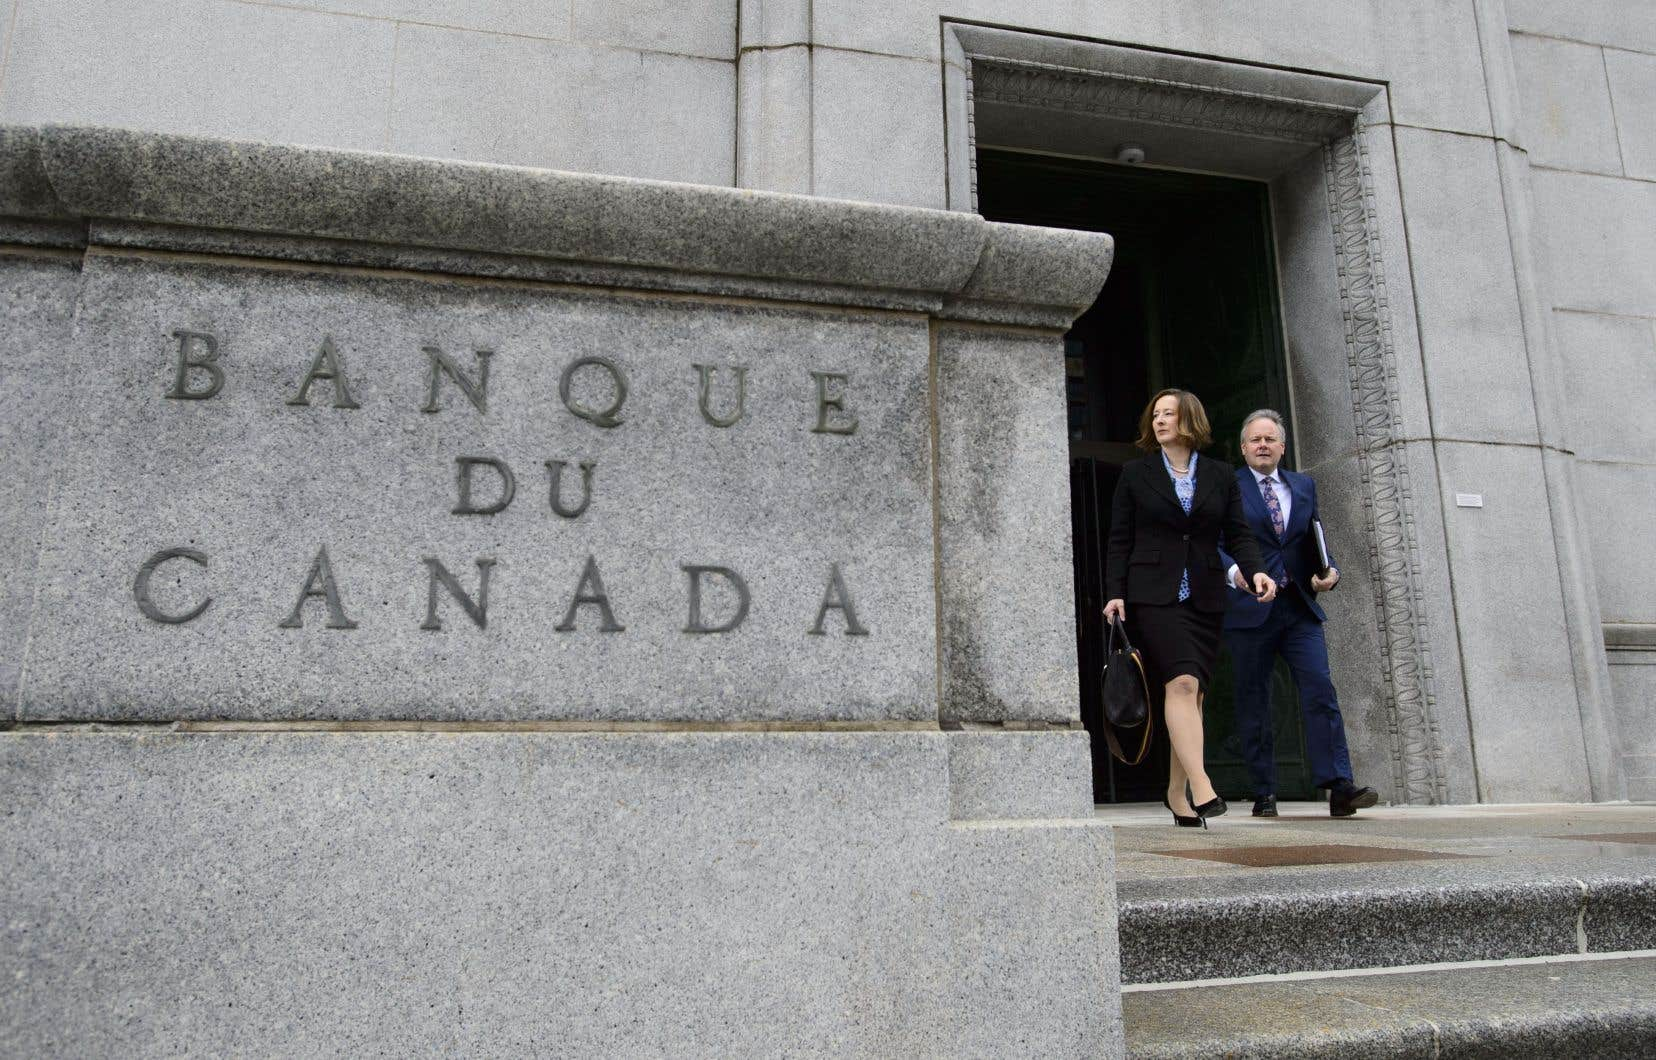 Stephen Poloz, gouverneur de la Banque du Canada, et la vice-gouverneure, Carolyn Wilkins